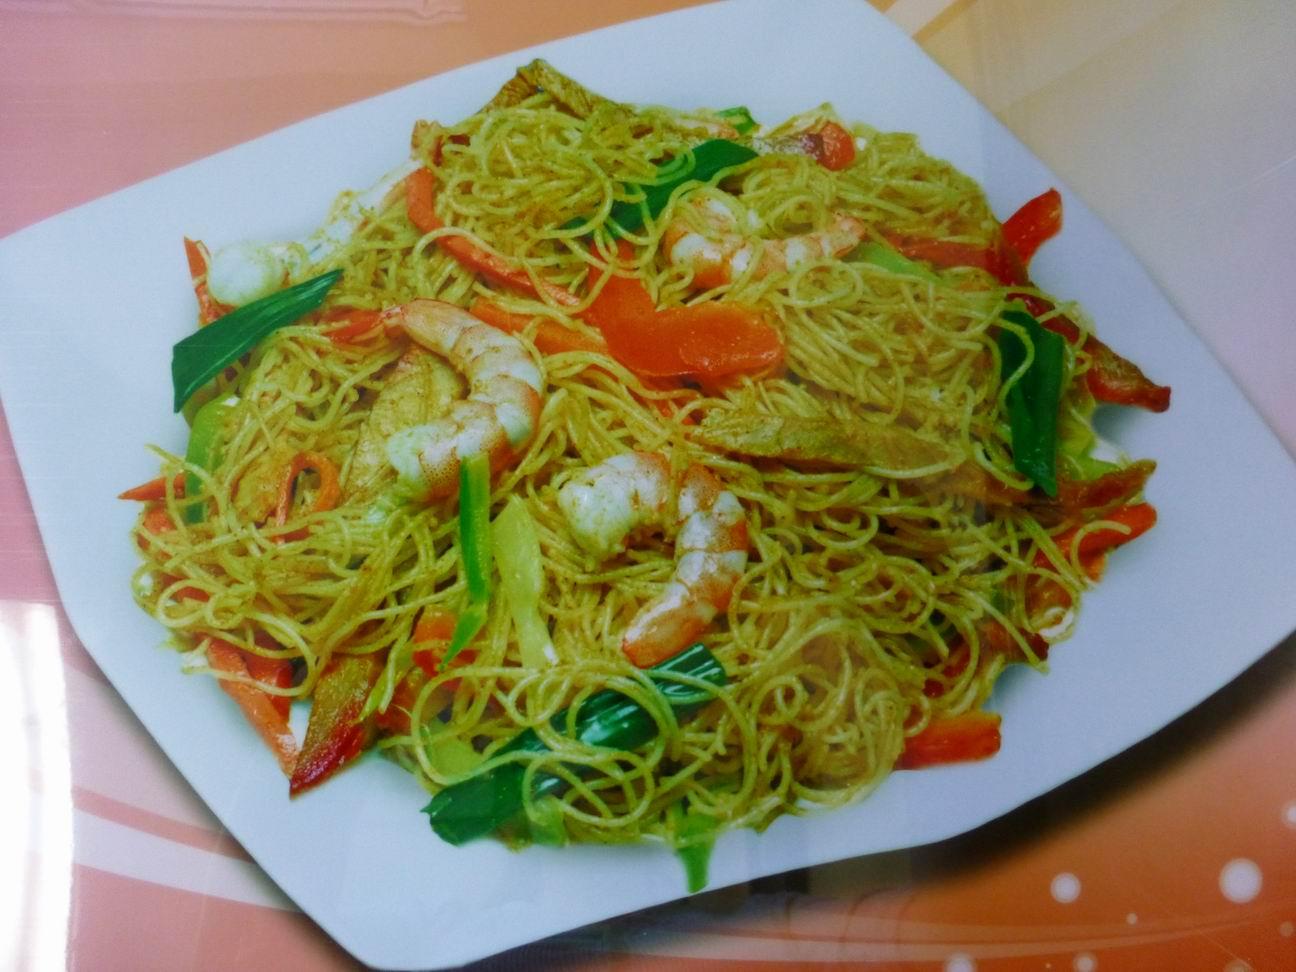 hong kong restaurant  photos  online coupons specials